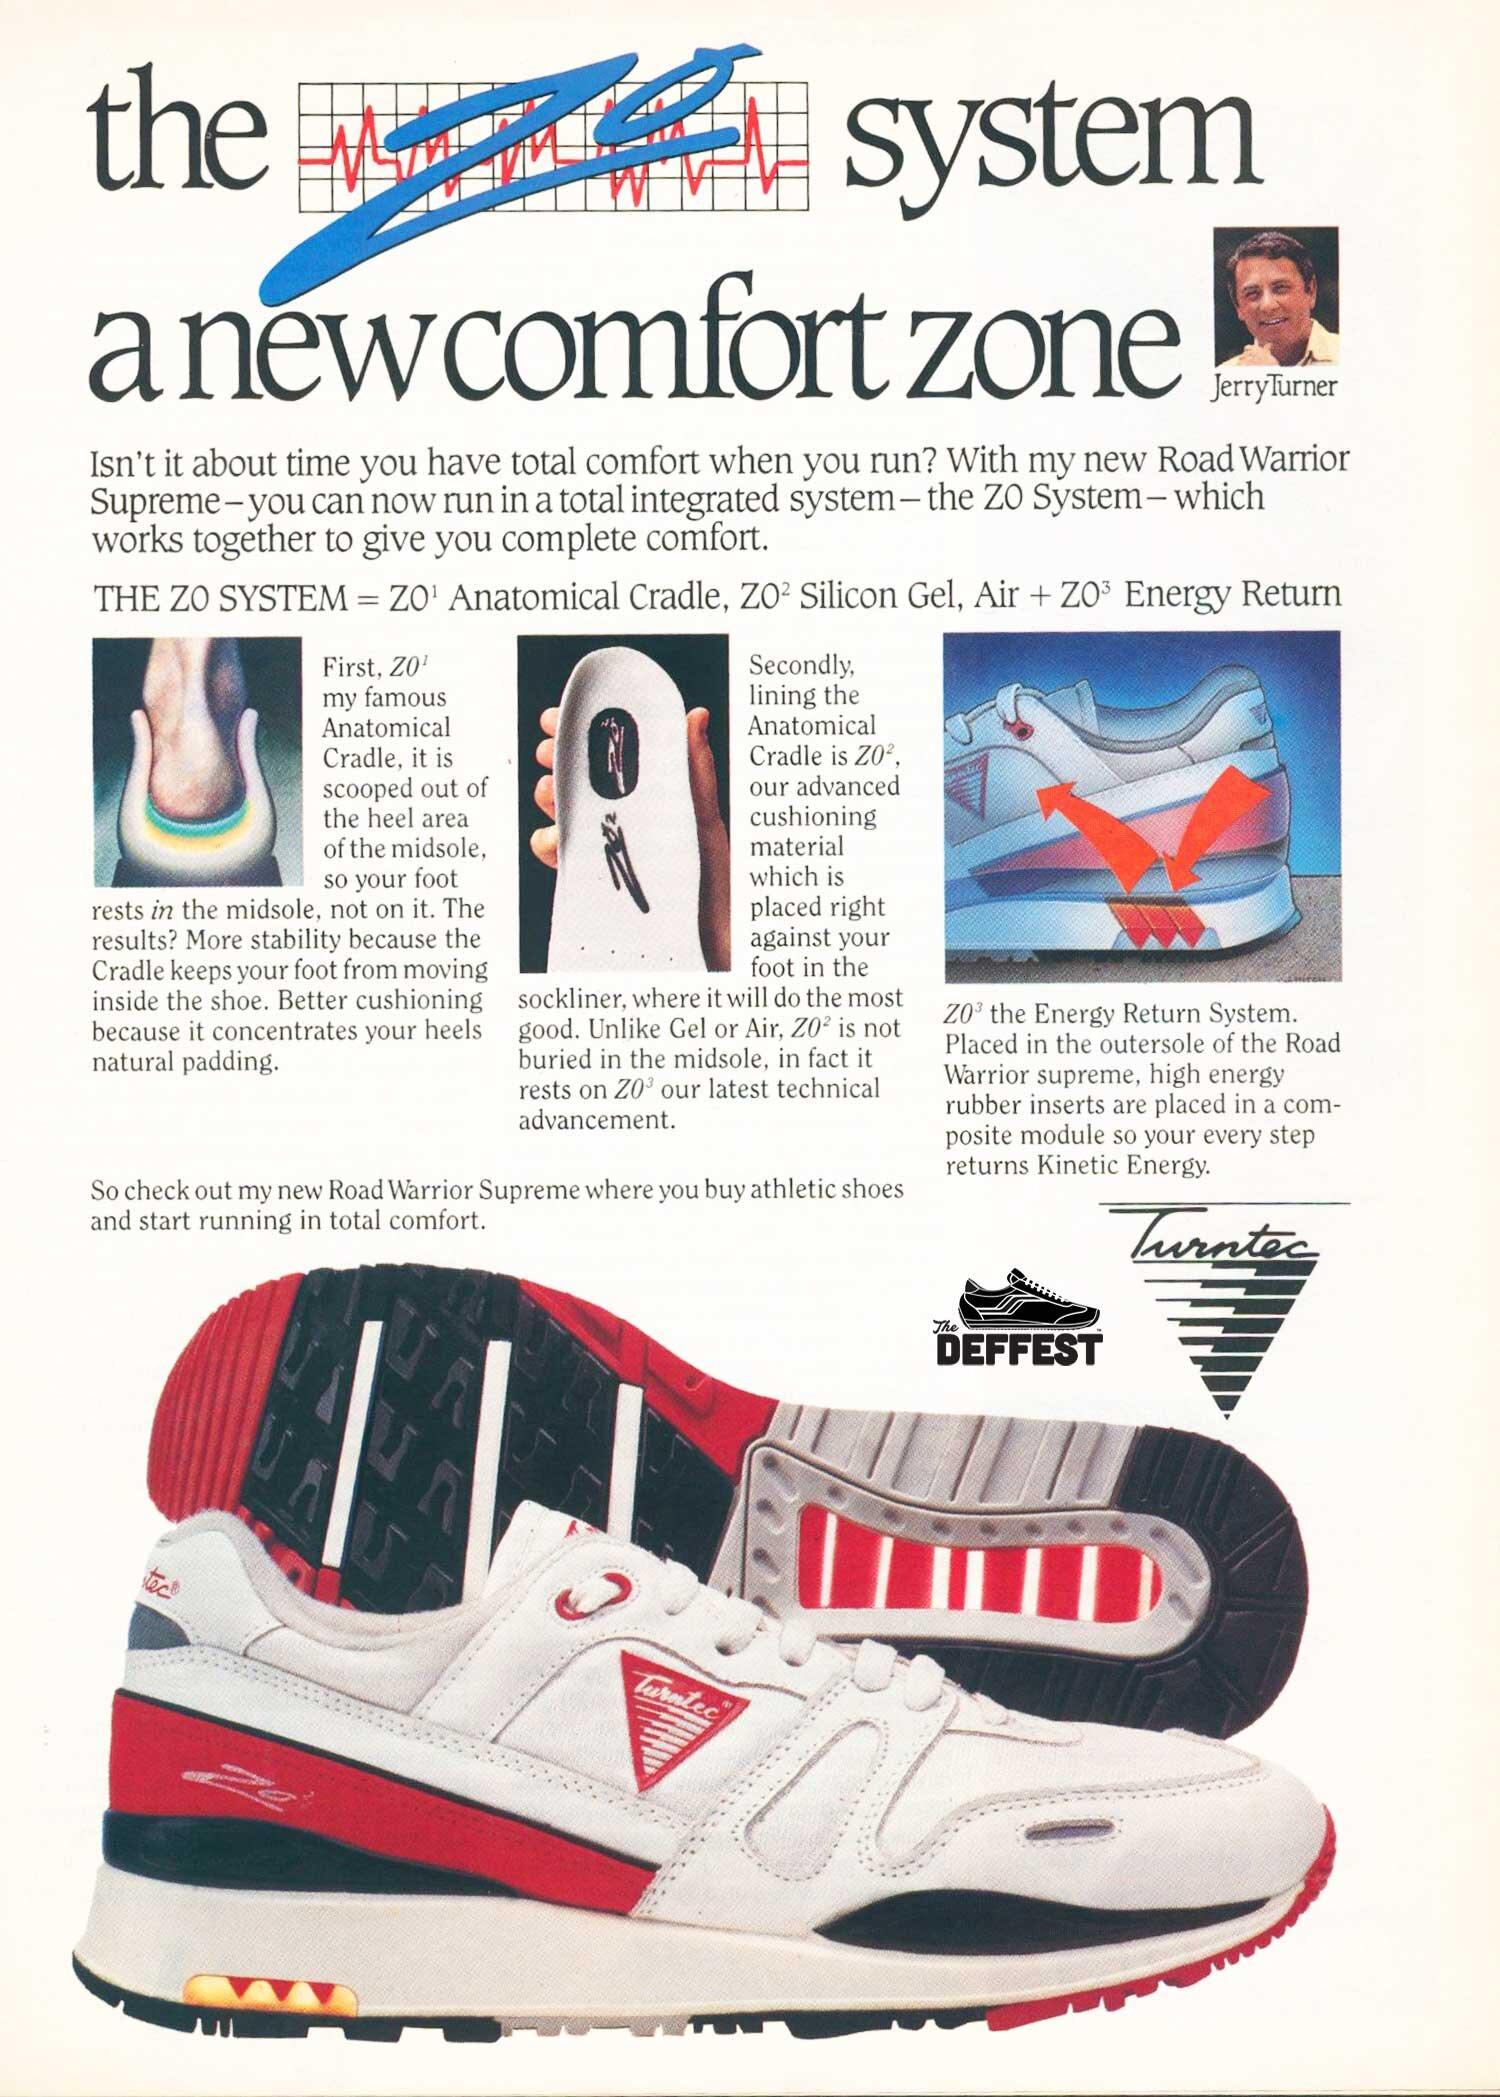 Vintage Mens Sneakers The Deffest A Vintage And Retro Sneaker Blog Vintage Ads